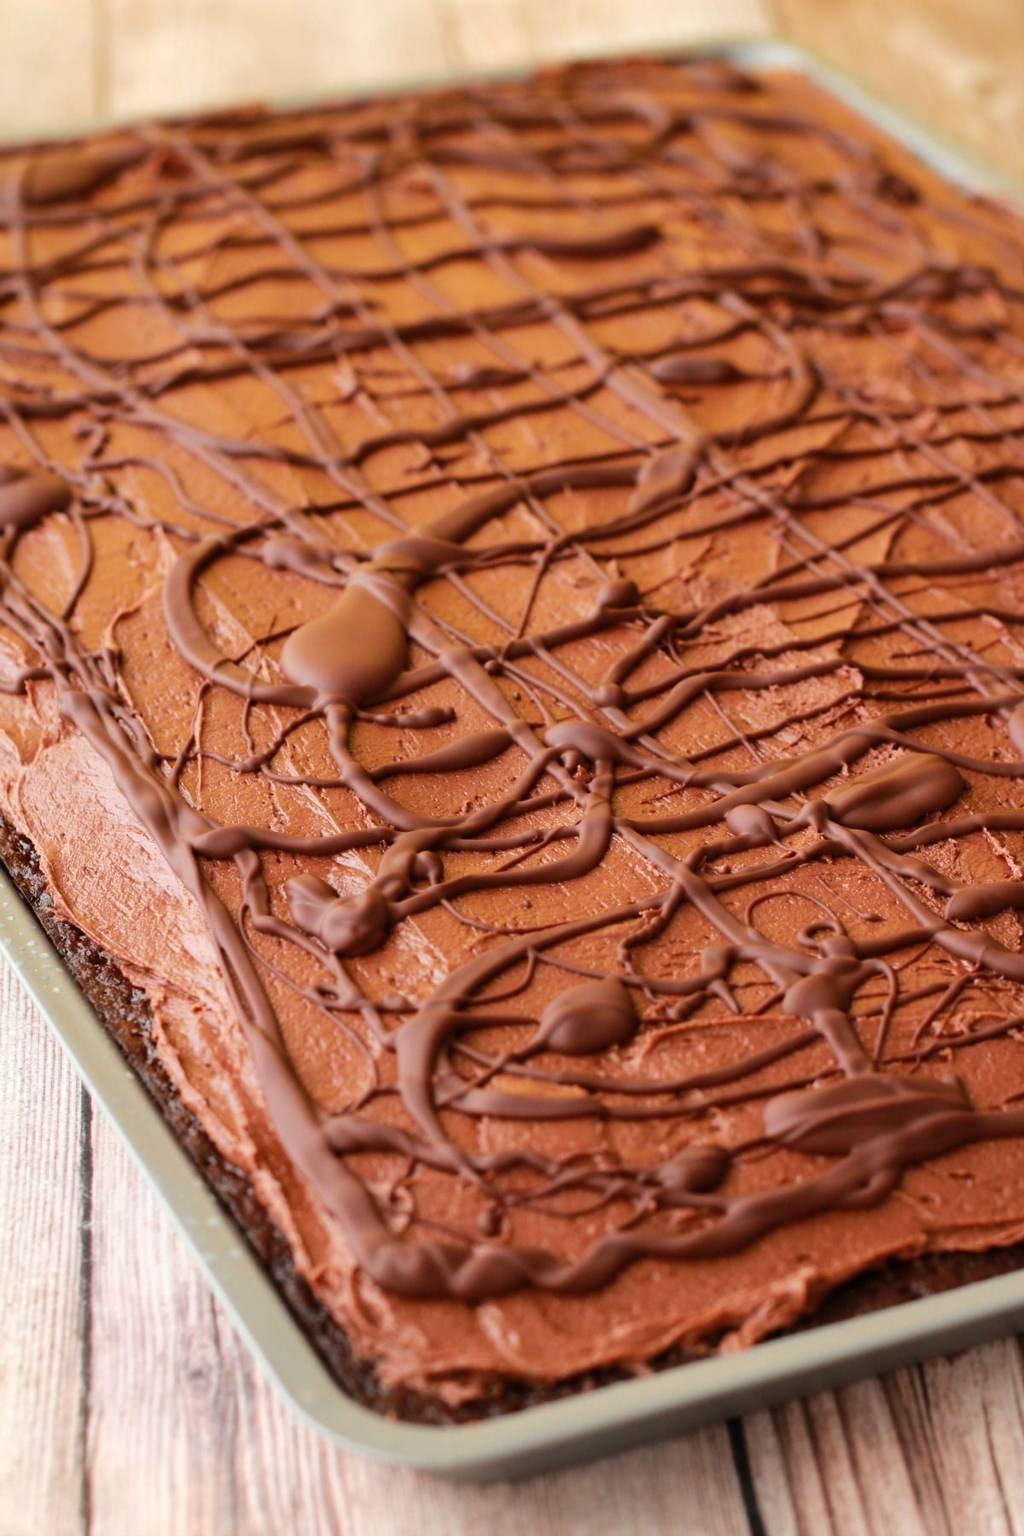 Chocolate Sheet Cake with Chocolate Fudge Frosting #vegan #lovingitvegan #vegancake #dessert #sheetcake